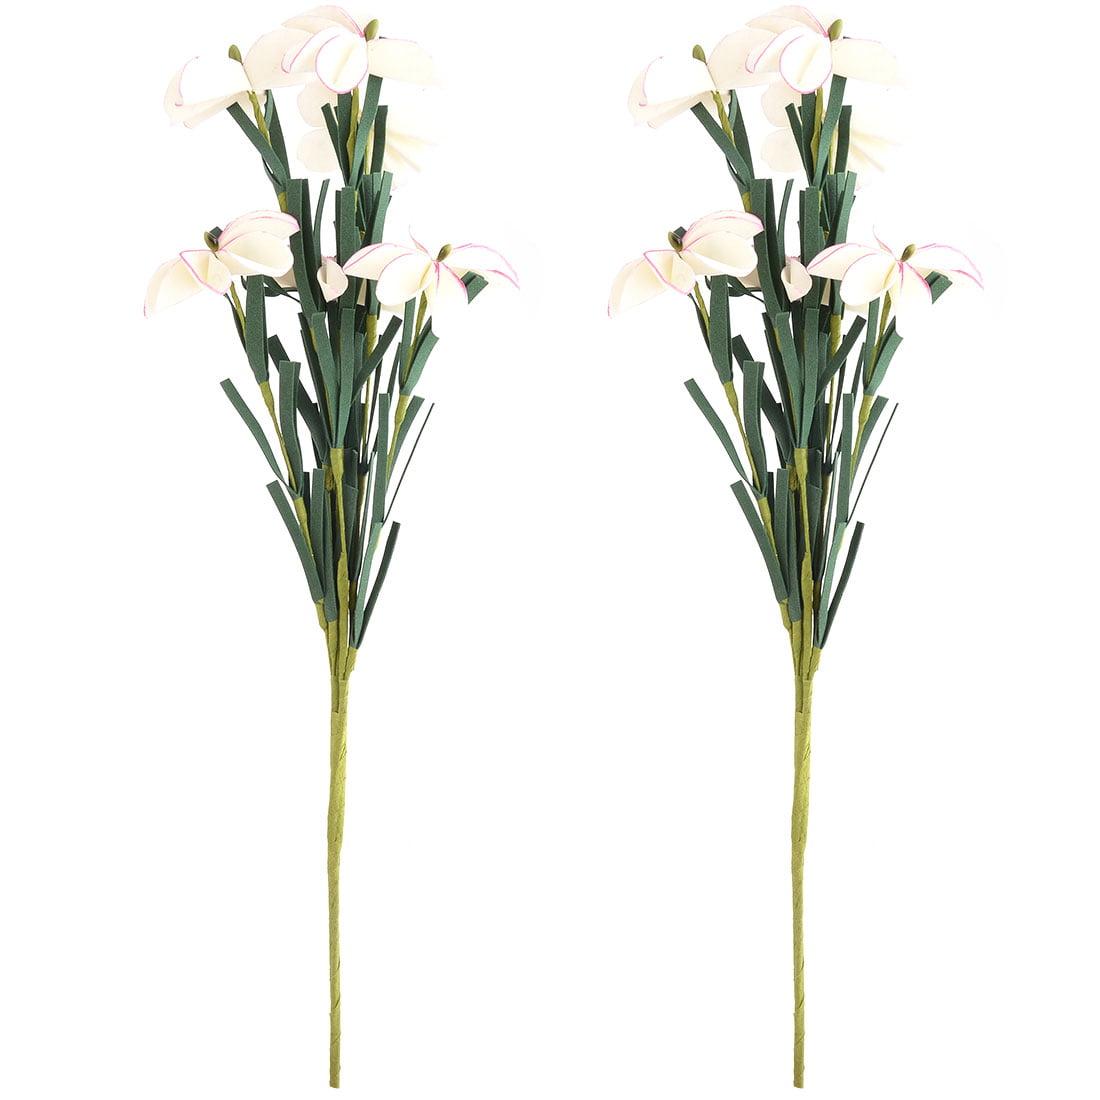 Festival Foam DIY Artificial Rose Bouquet Flower Beige 16.5 Inch Height 2pcs